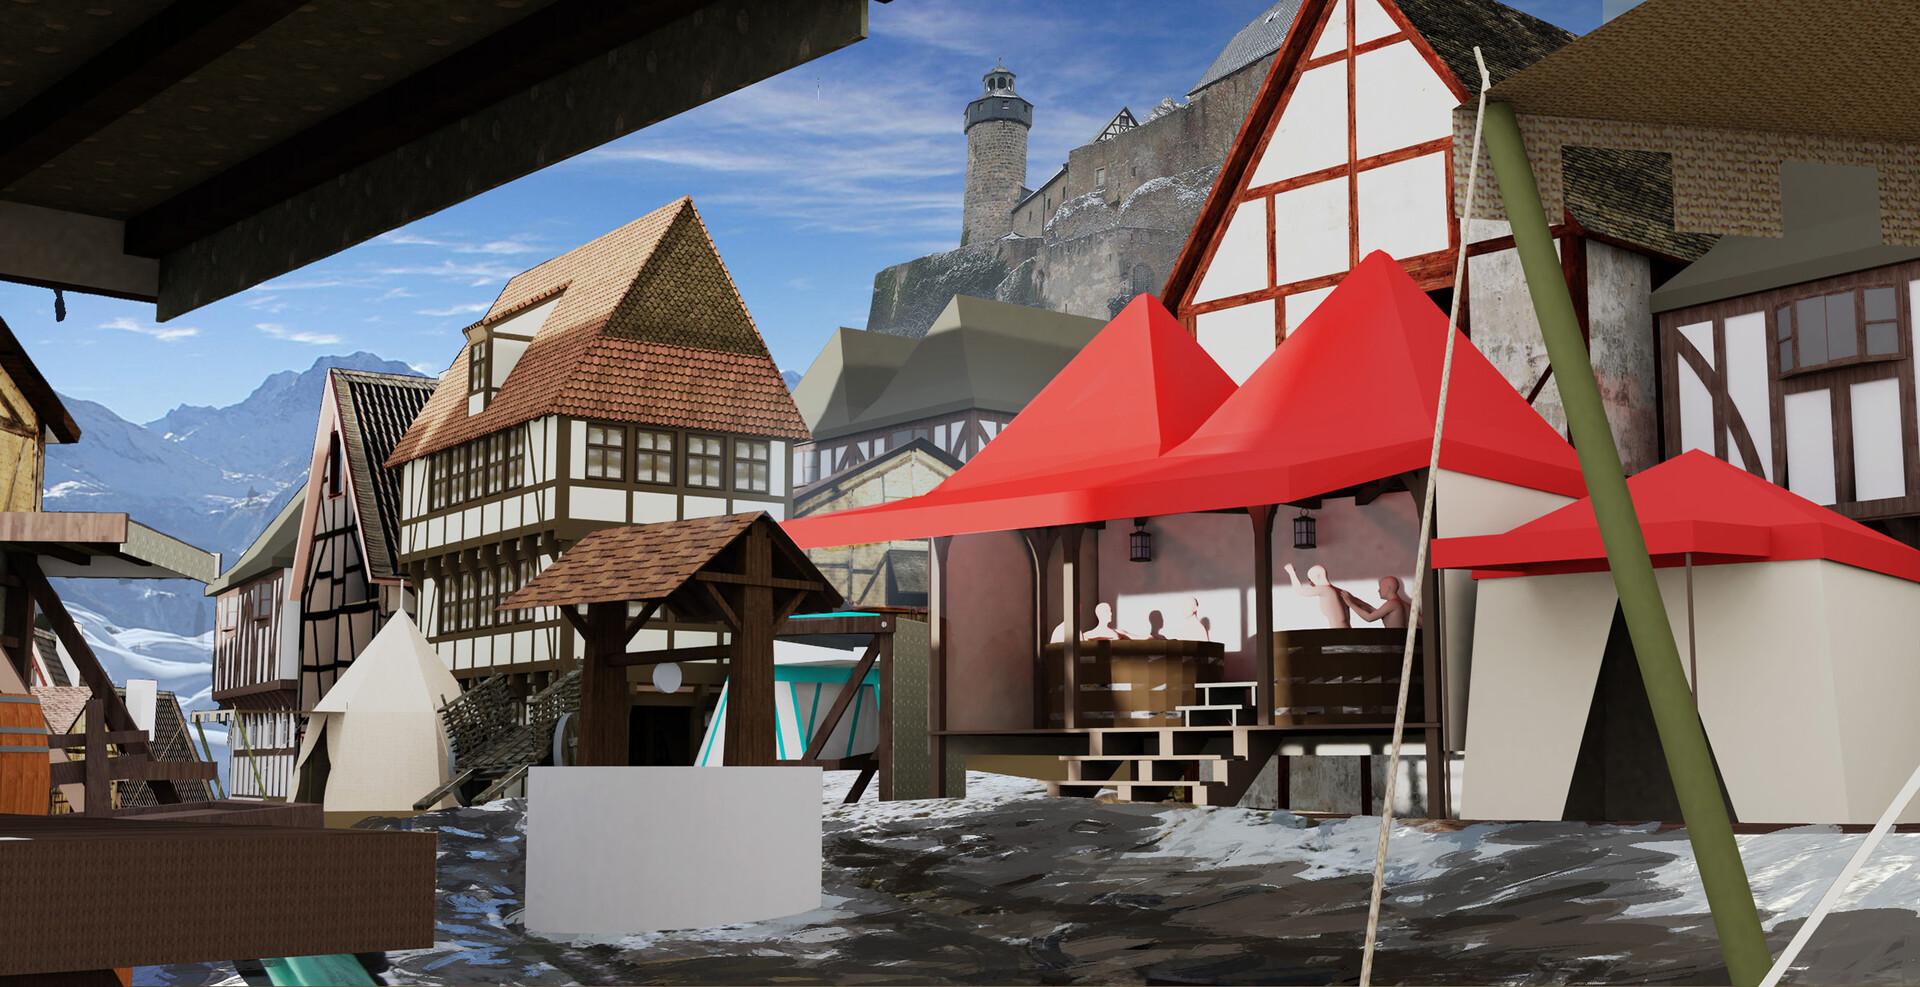 Francis goeltner medievalfantasy travelingbathhouse02 m